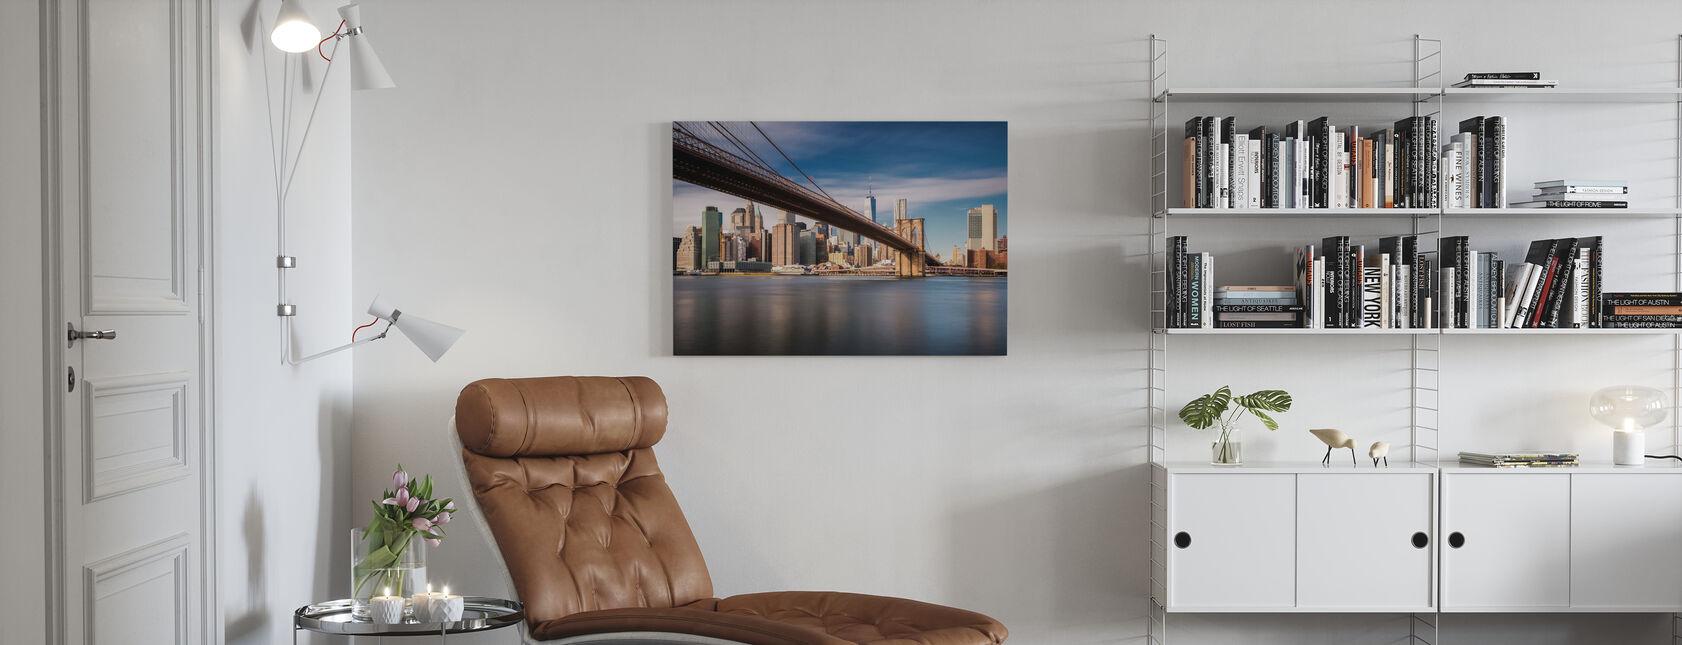 Keskustan silta - Canvastaulu - Olohuone